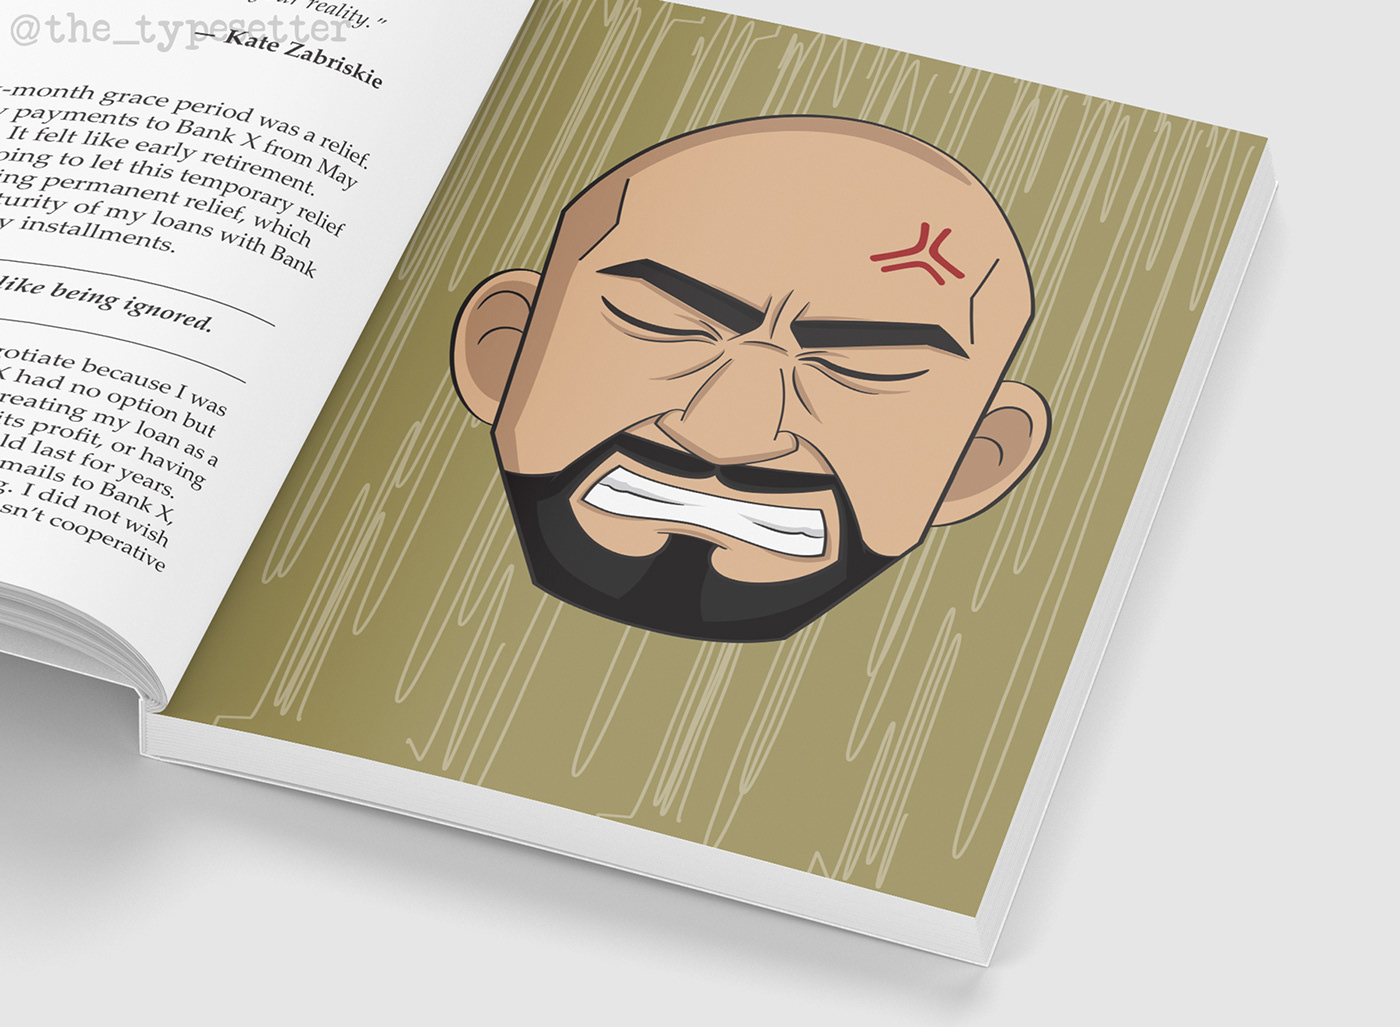 Image may contain: illustration, cartoon and drawing